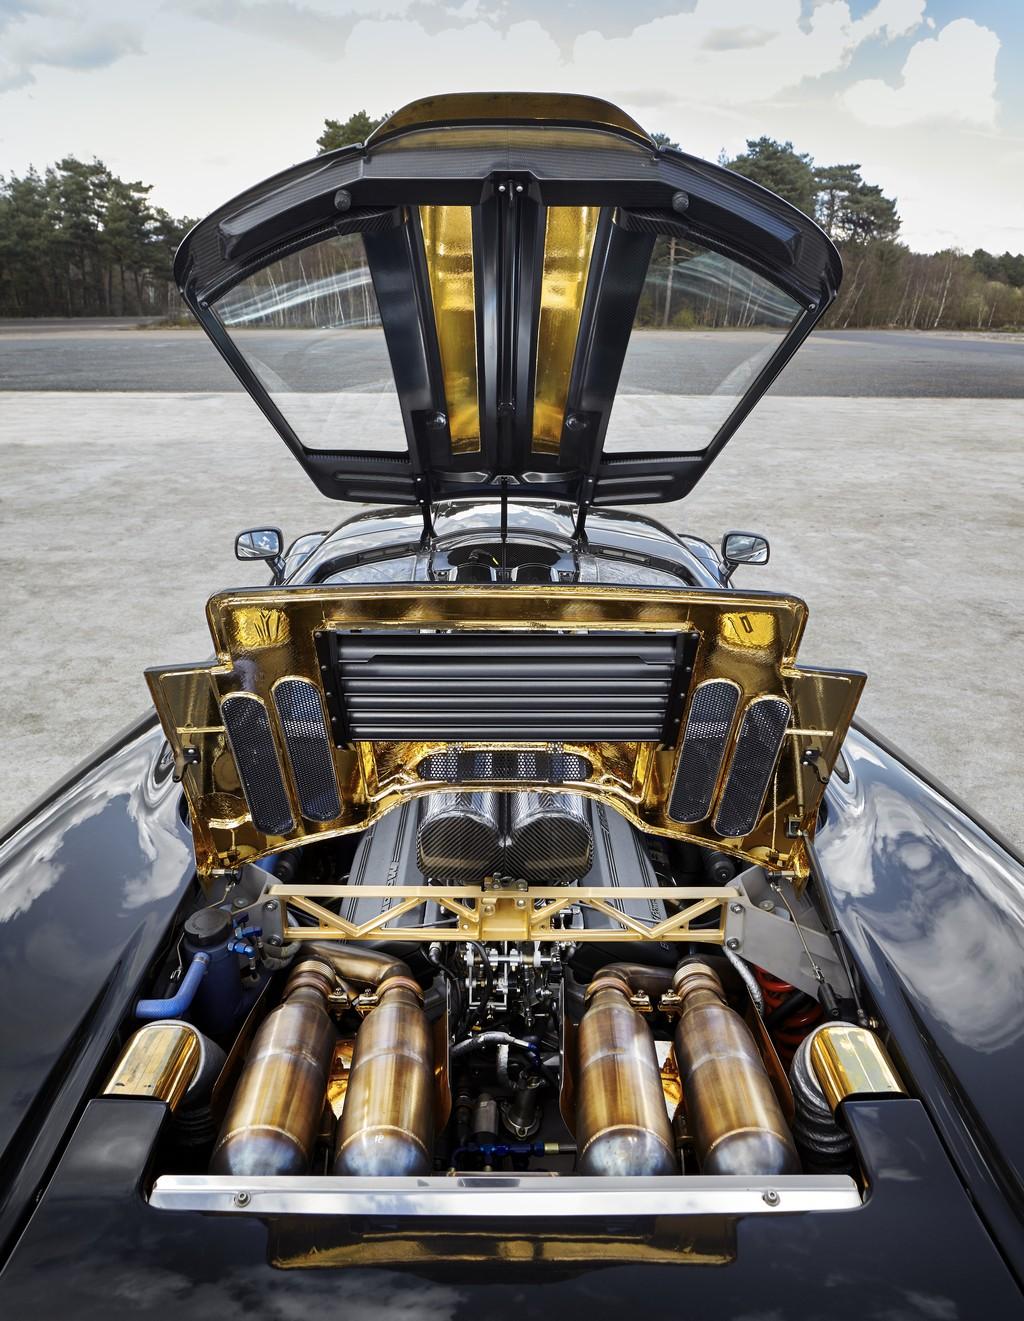 McLaren F1 Motore Oro